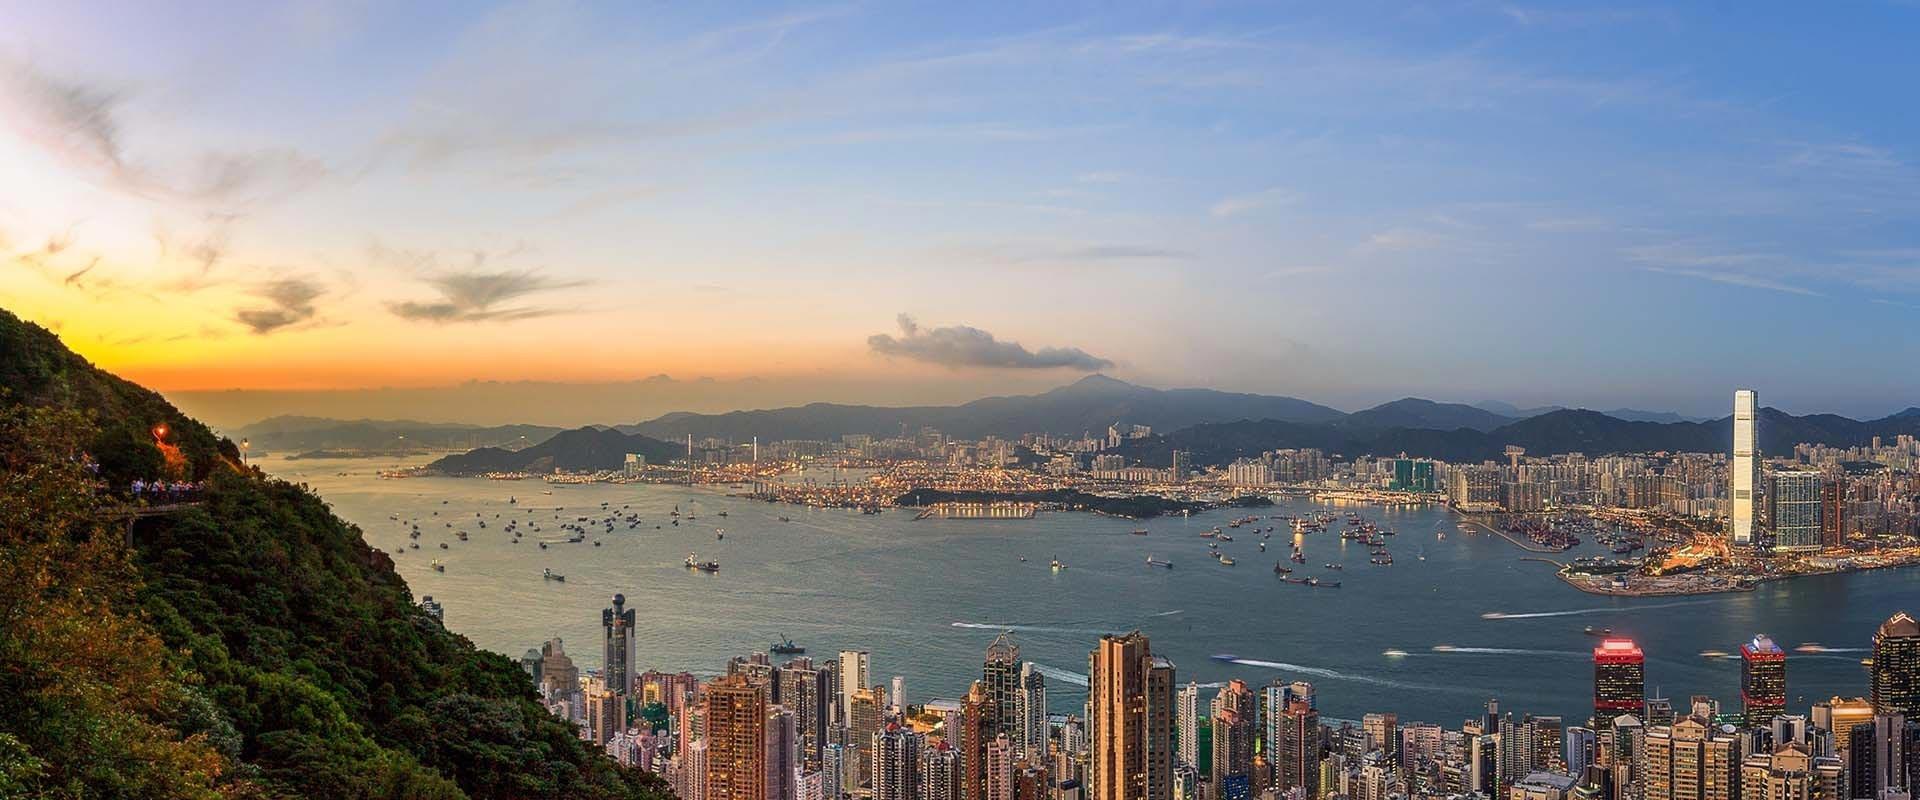 Hong Kong Public Holidays 2020 - Publicholidays.hk-2020 Calendar Hong Kong Public Holidays